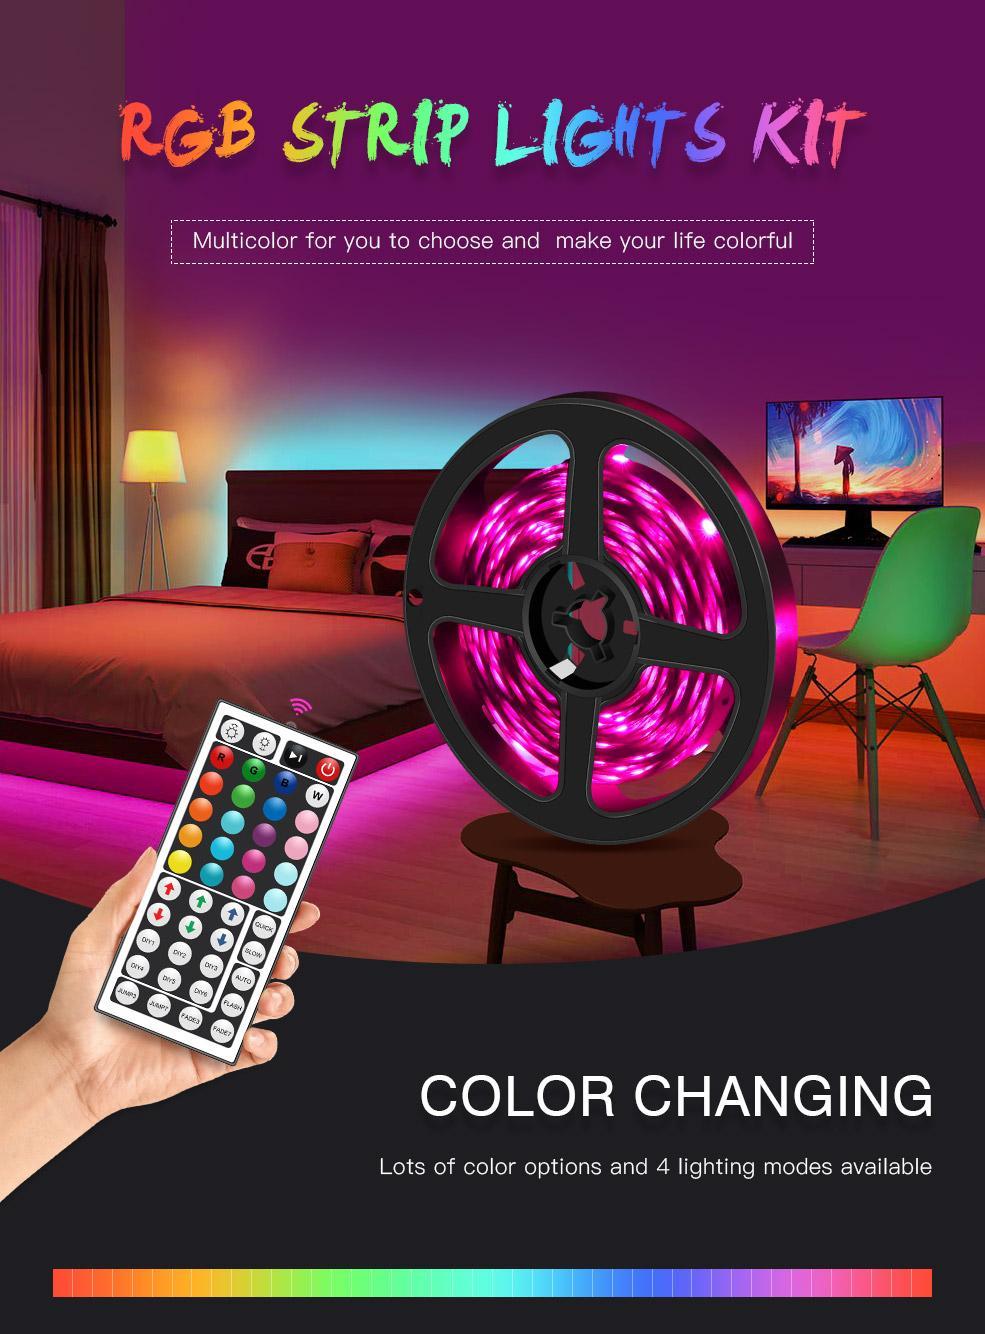 LED Bant Şerit Işıkları RGB 16.4FT / 5 M SMD 5050 DC12V Esnek Les Şeritler Işıklar 50Led / Metre 16 Sonfferent Statik Renkler